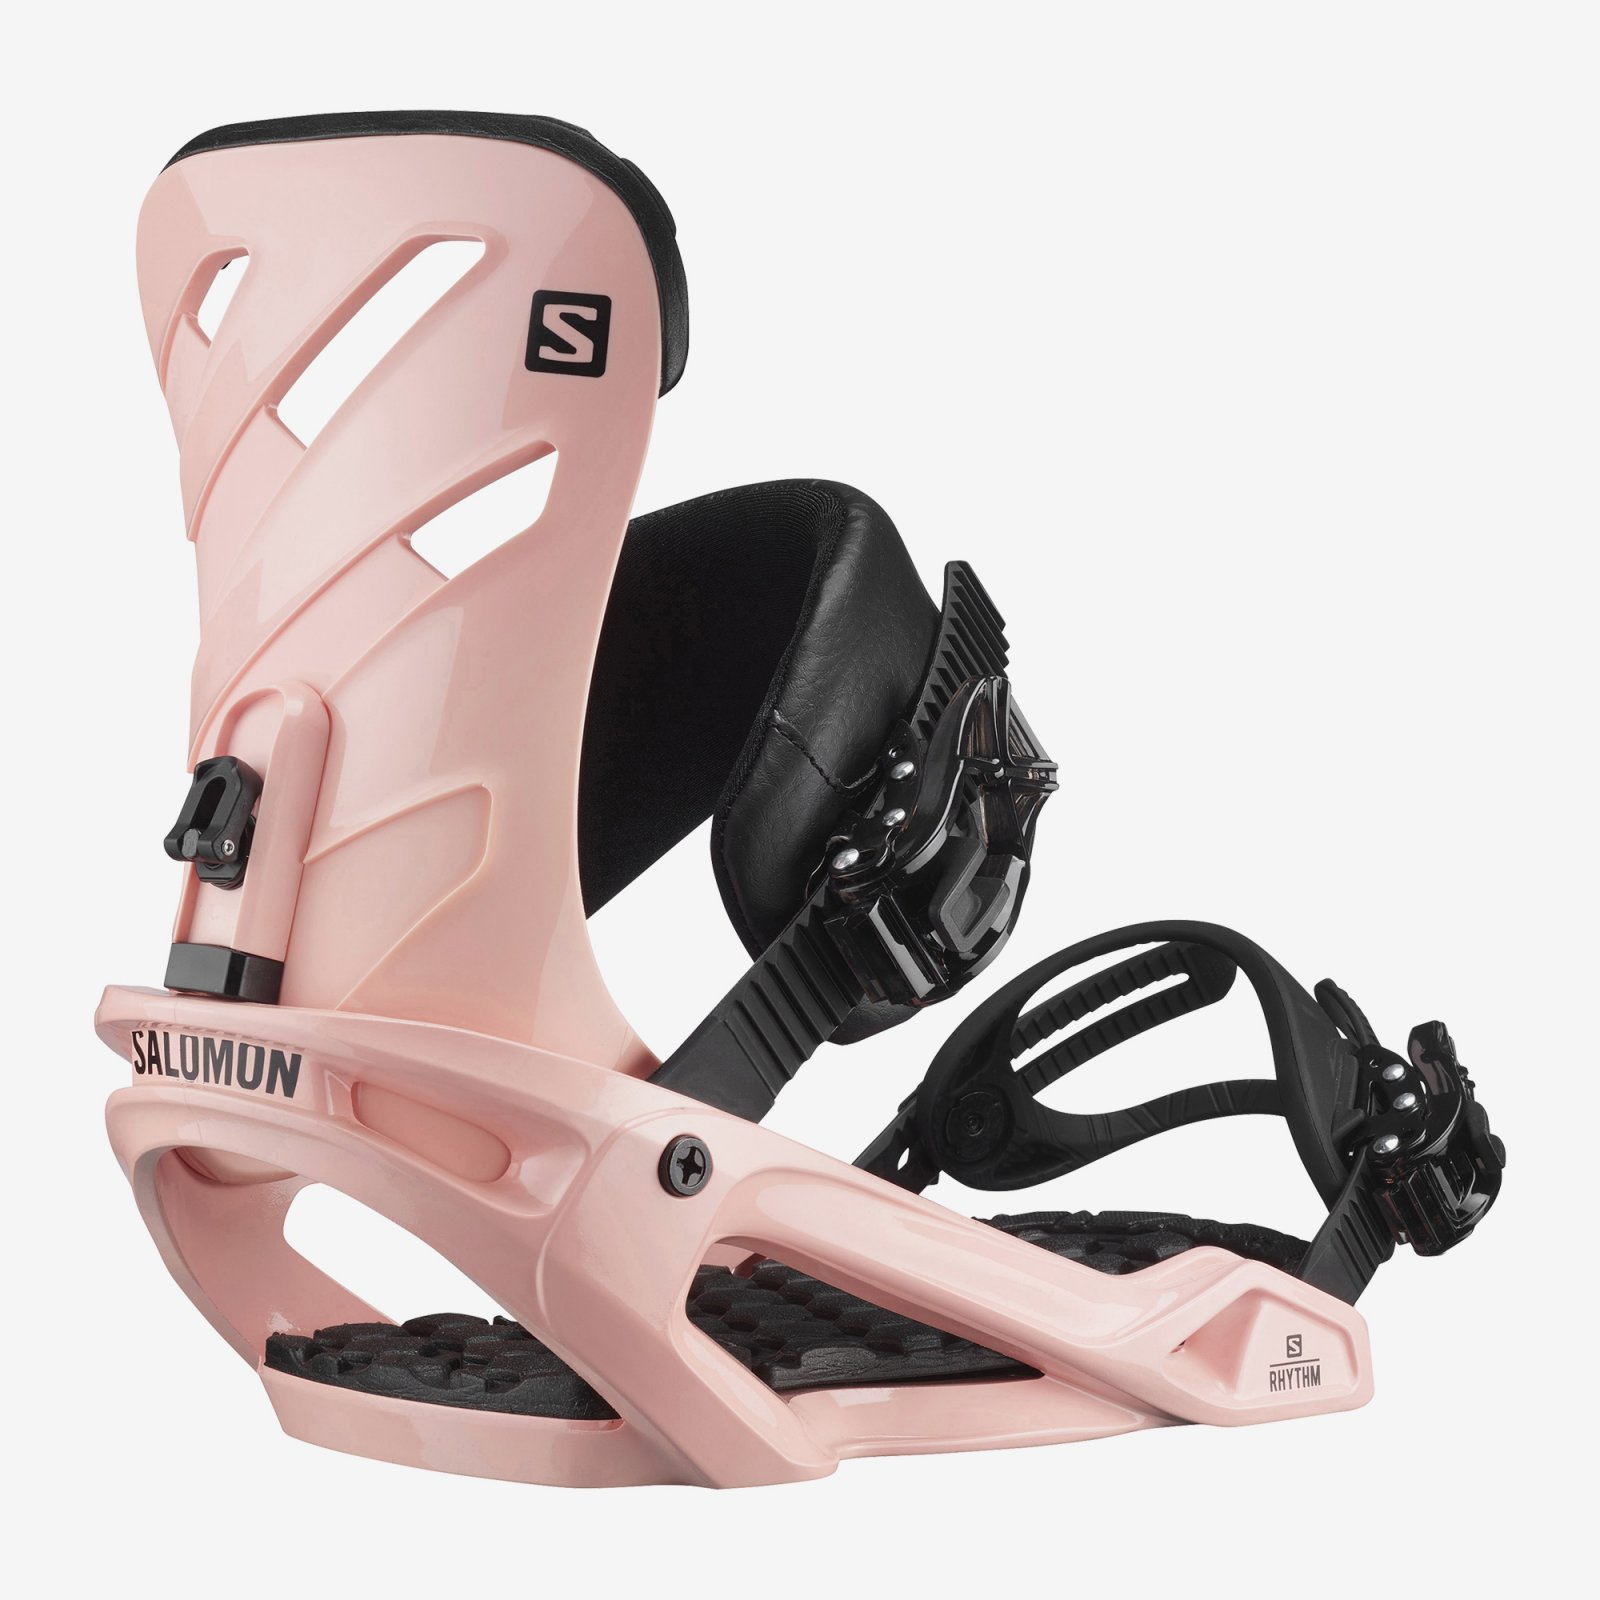 2021 Salomon Rhythm Snowboard Bindings